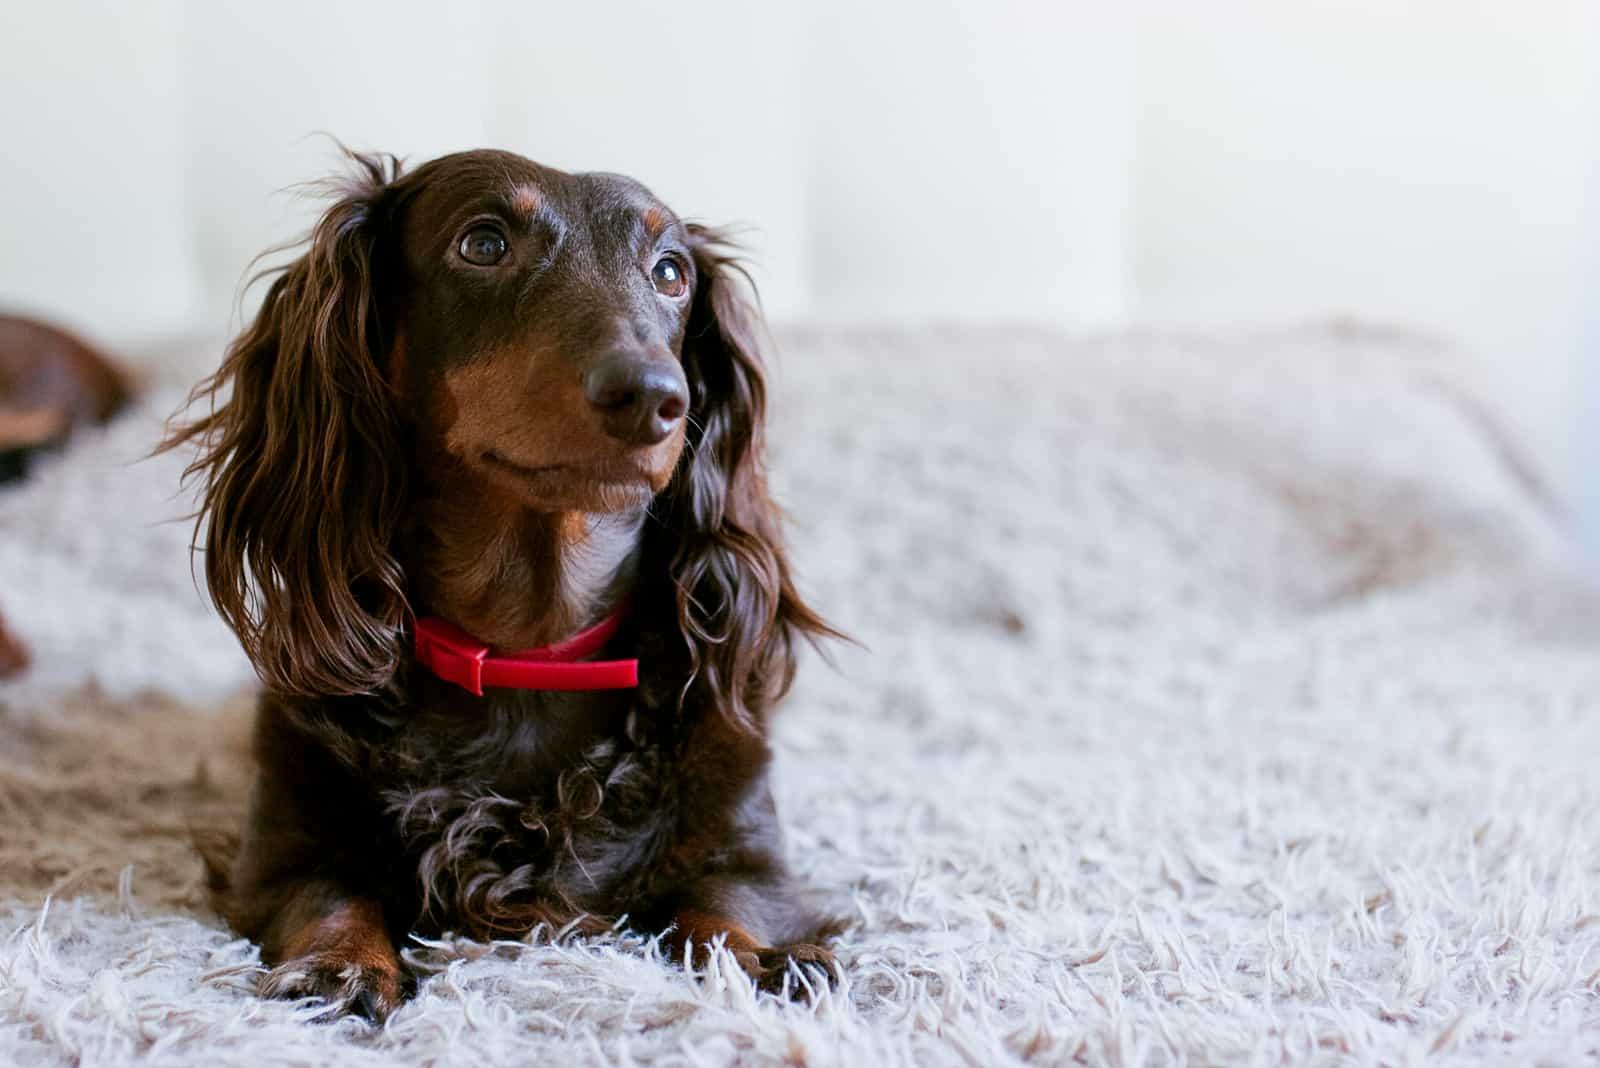 Brown dachshund lying in fluffy bed